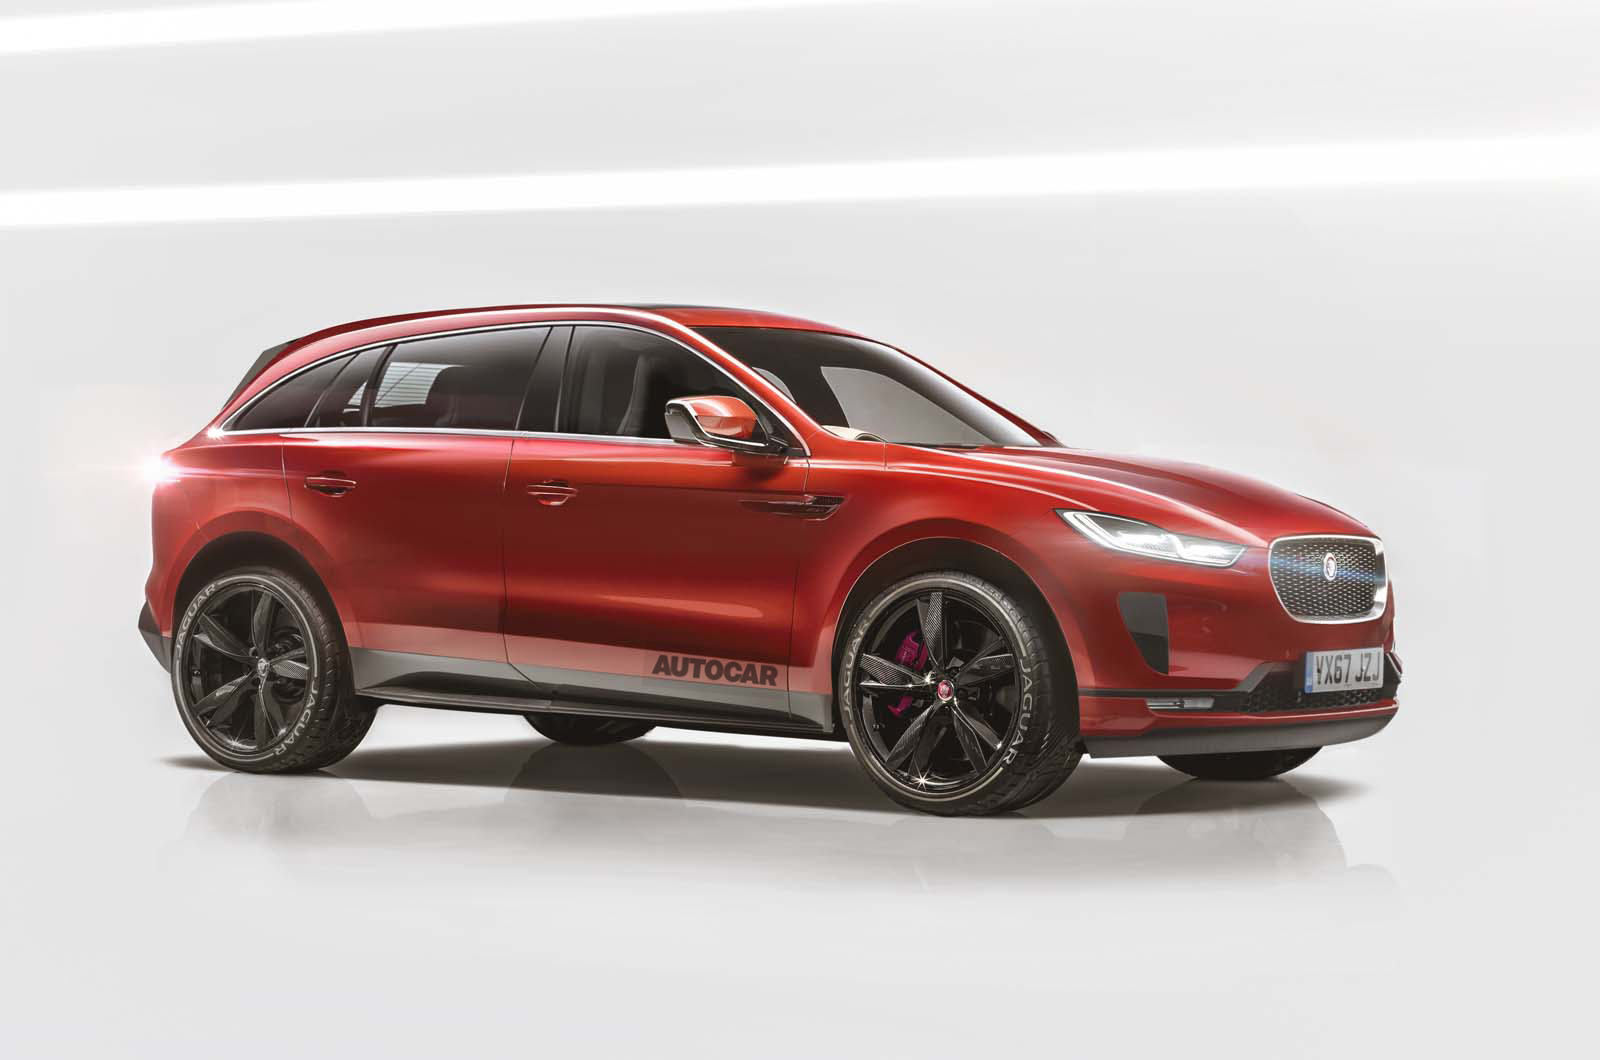 Redesign and Concept 2021 Jaguar J Type